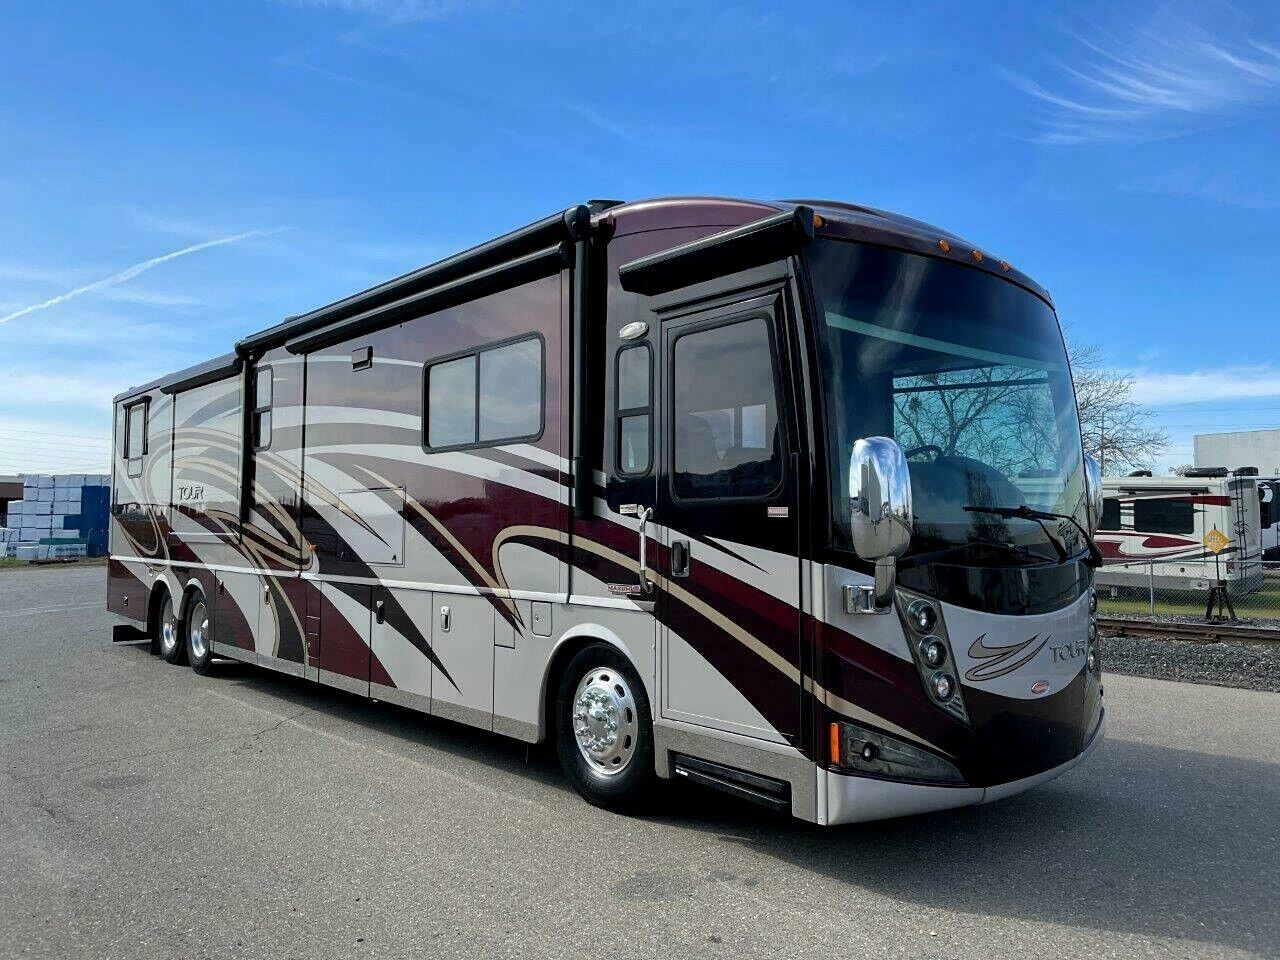 2012 WINNEBAGO TOUR 42JD CLASS A COACH DIESEL PUSHER MOTORHOME BATH & HALF